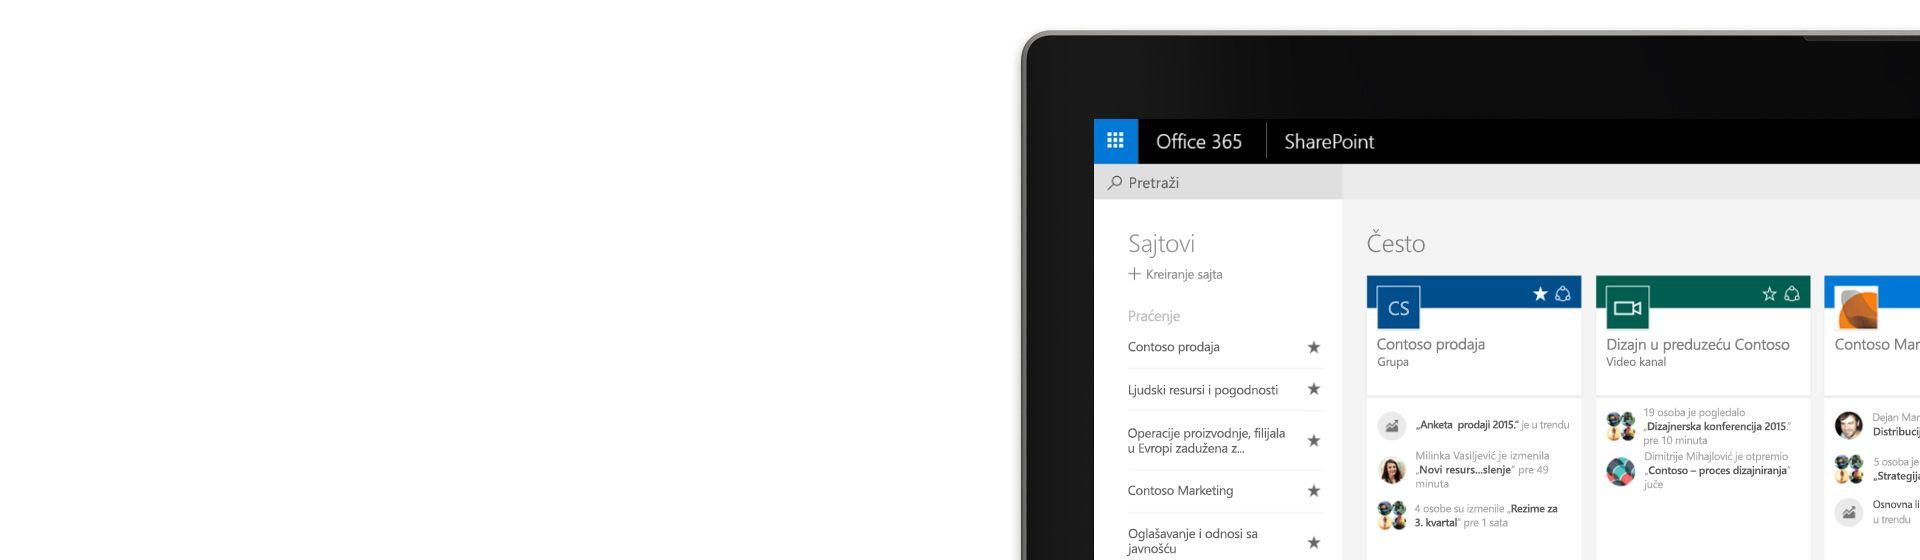 Ugao ekrana laptopa koji prikazuje Office 365 SharePoint za Contoso